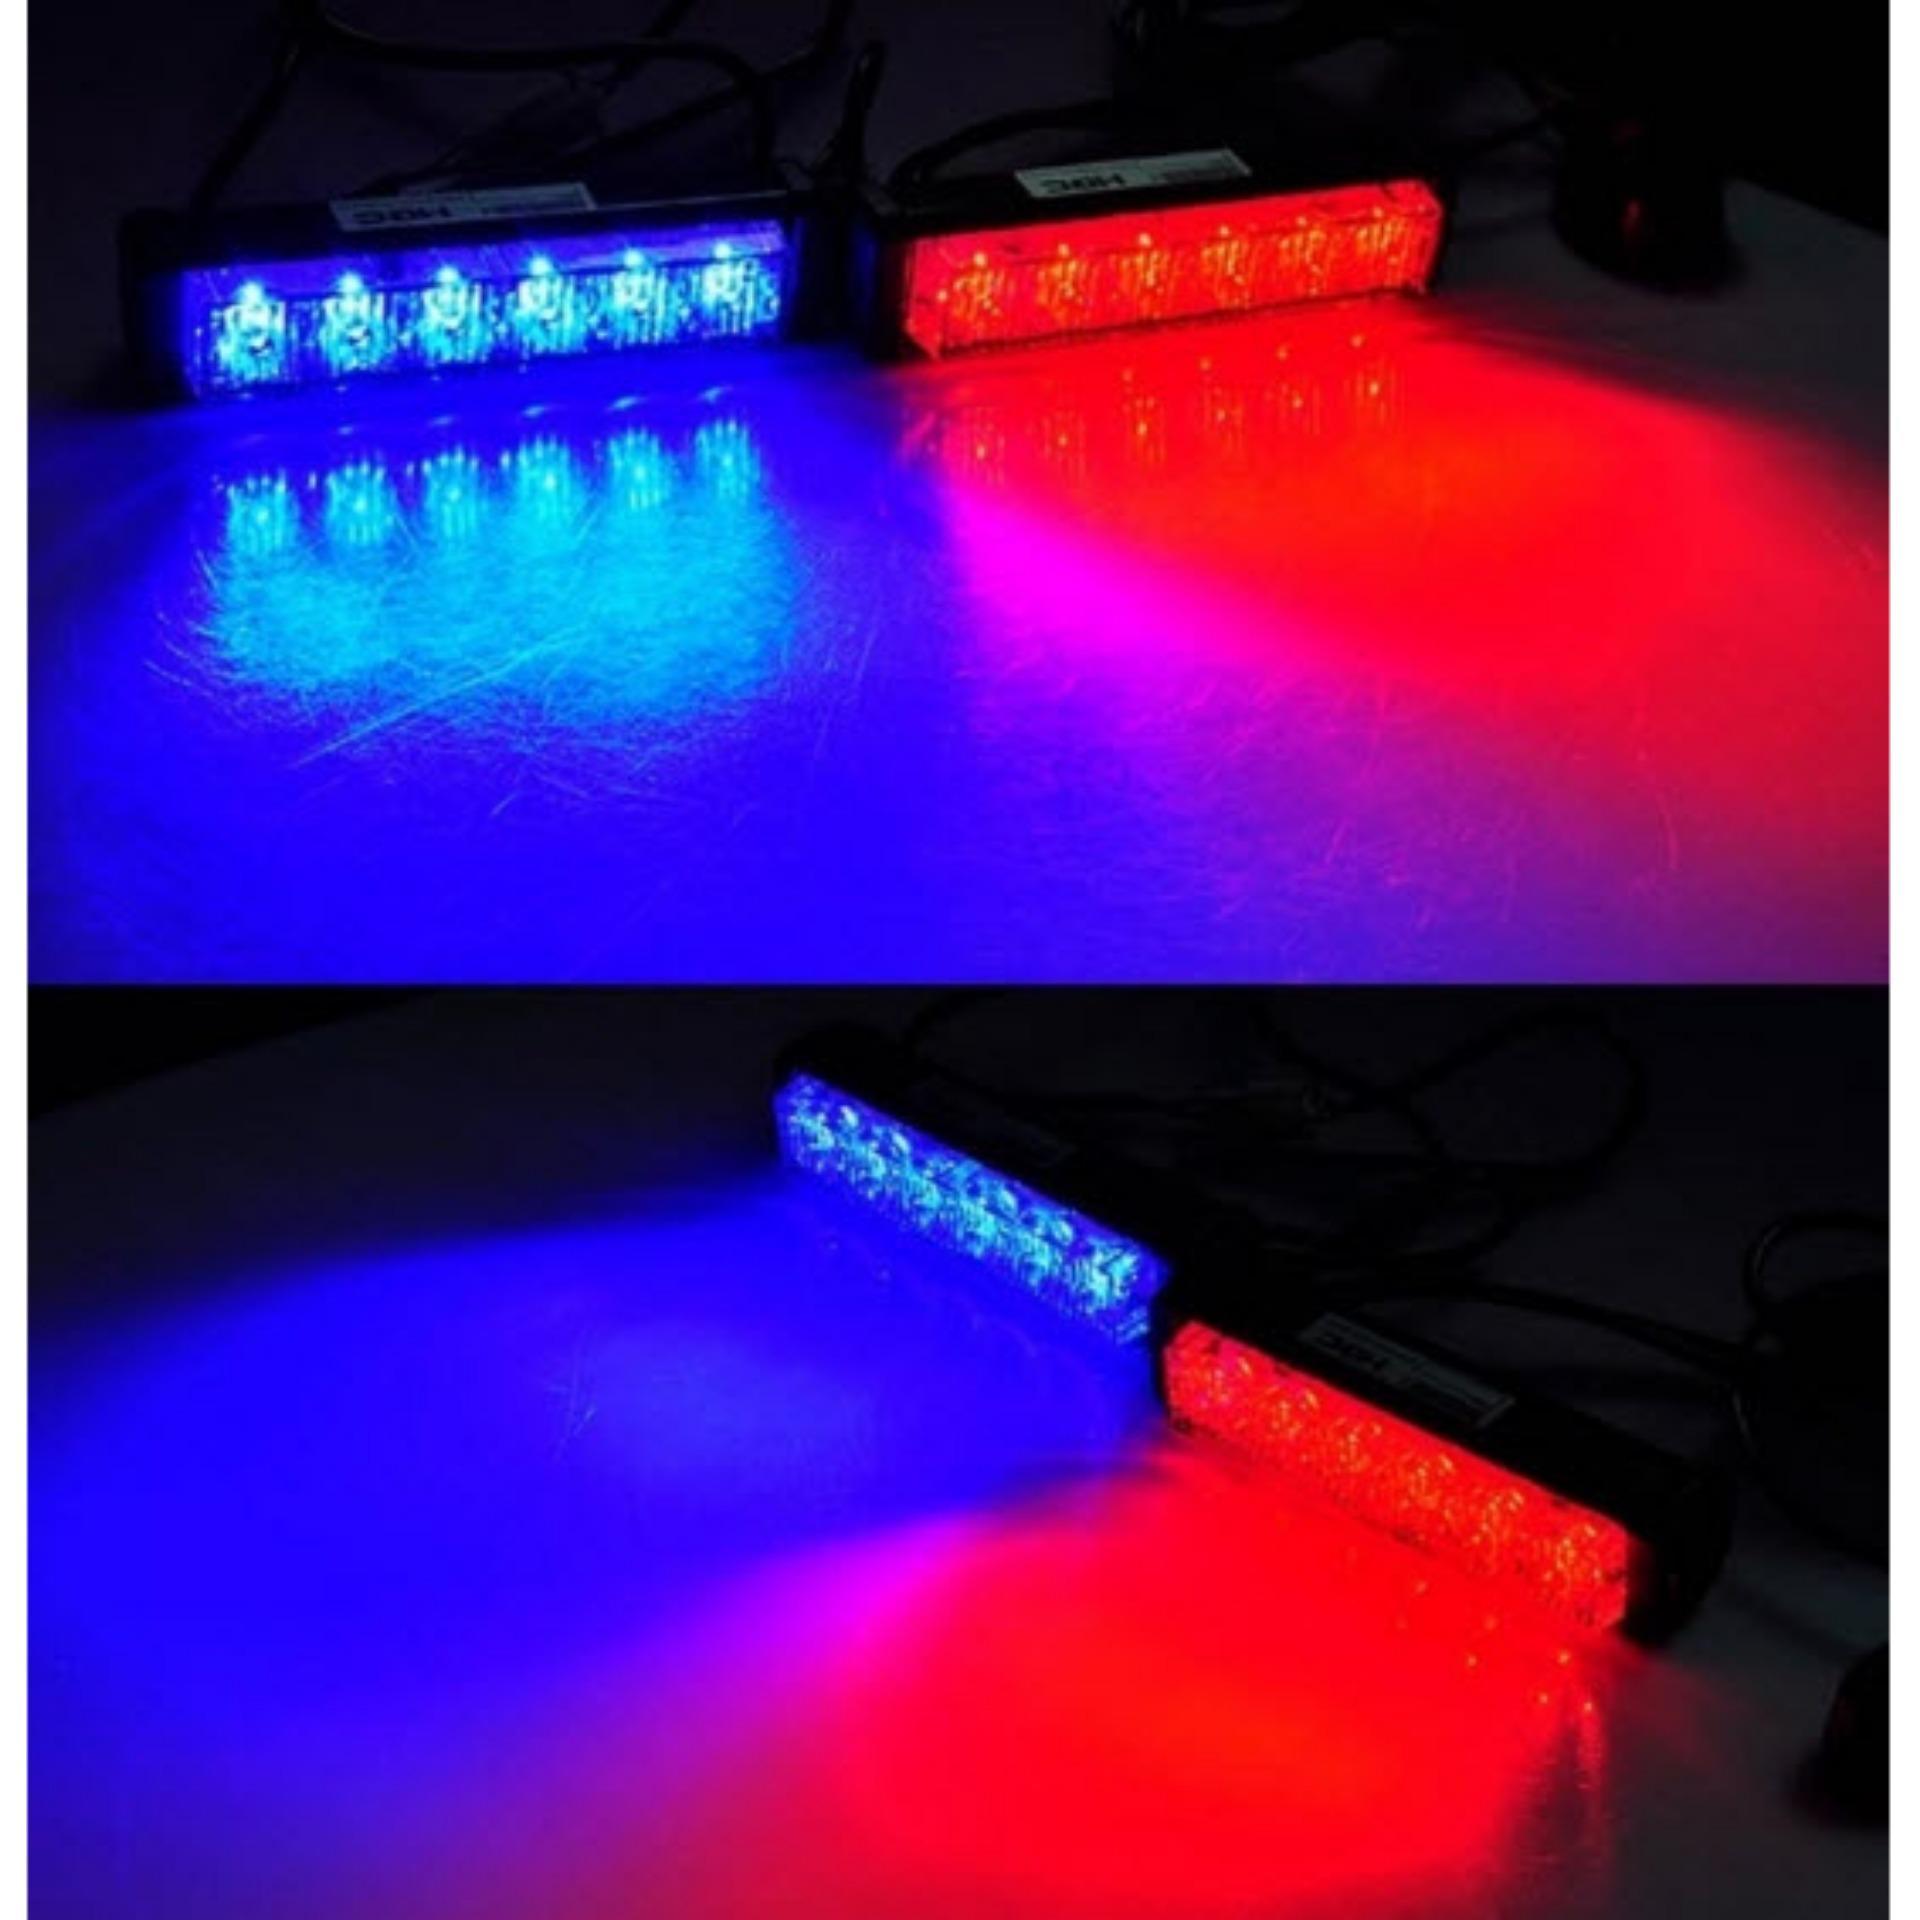 Philippines 2x6 federal light bar strobe blinkerredblue price 2x6 federal light bar strobe blinkerredblue aloadofball Choice Image